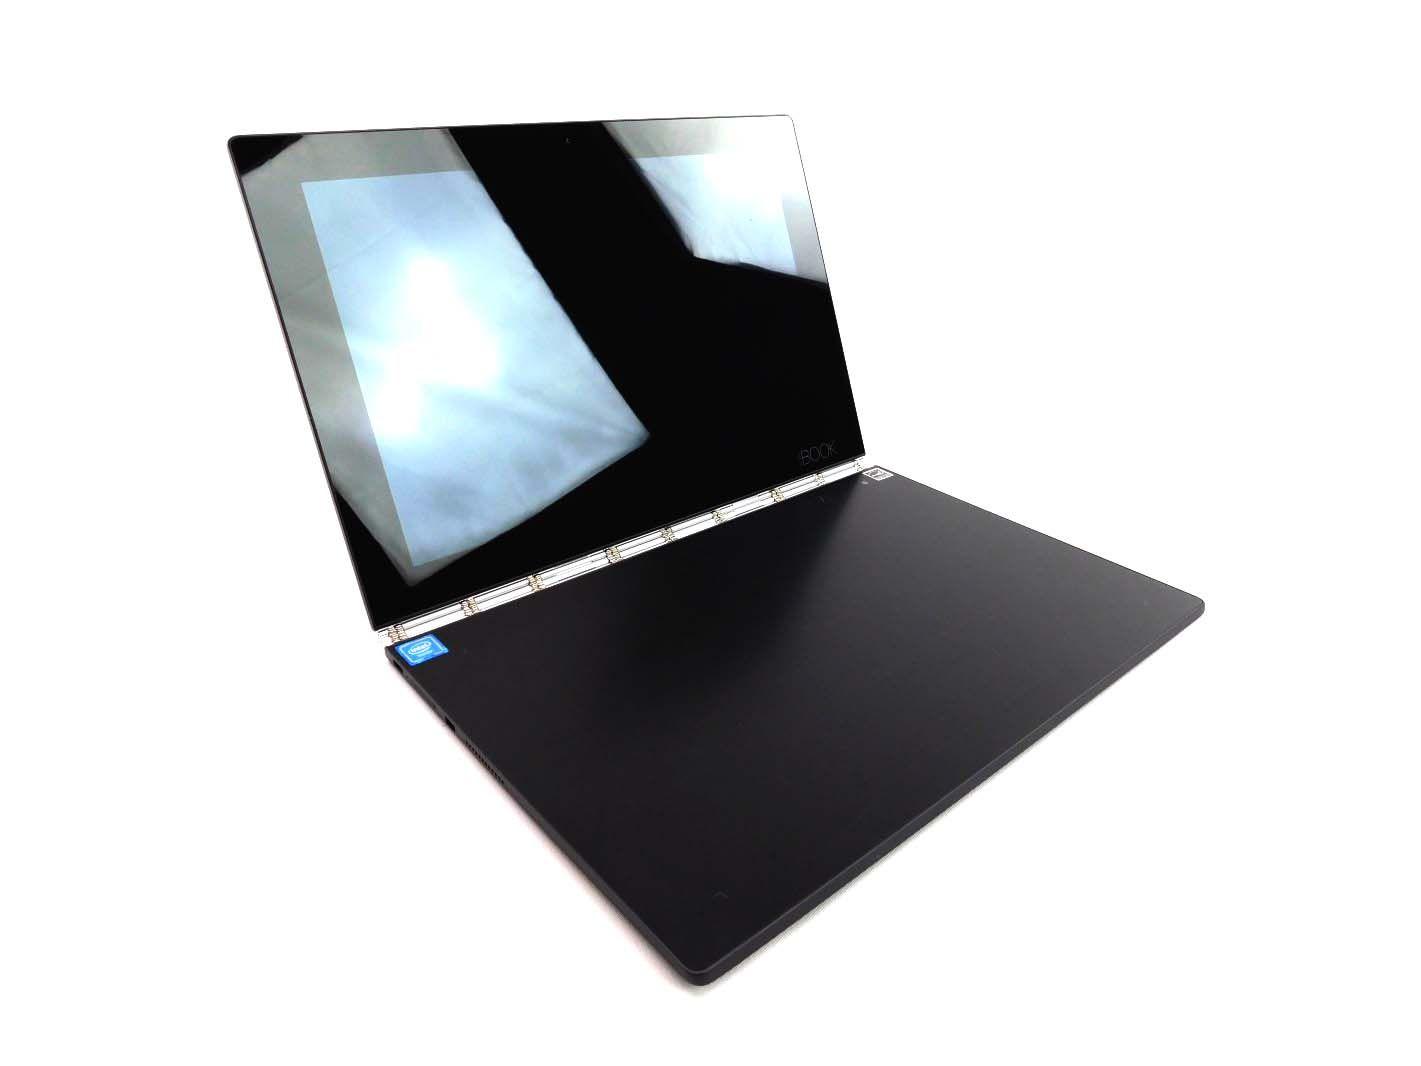 Lordcomputer Lenovo Yoga Book 10 1 Windows 2 In 1 4gb Ram 128gb Ssd Tablet Carbon Black